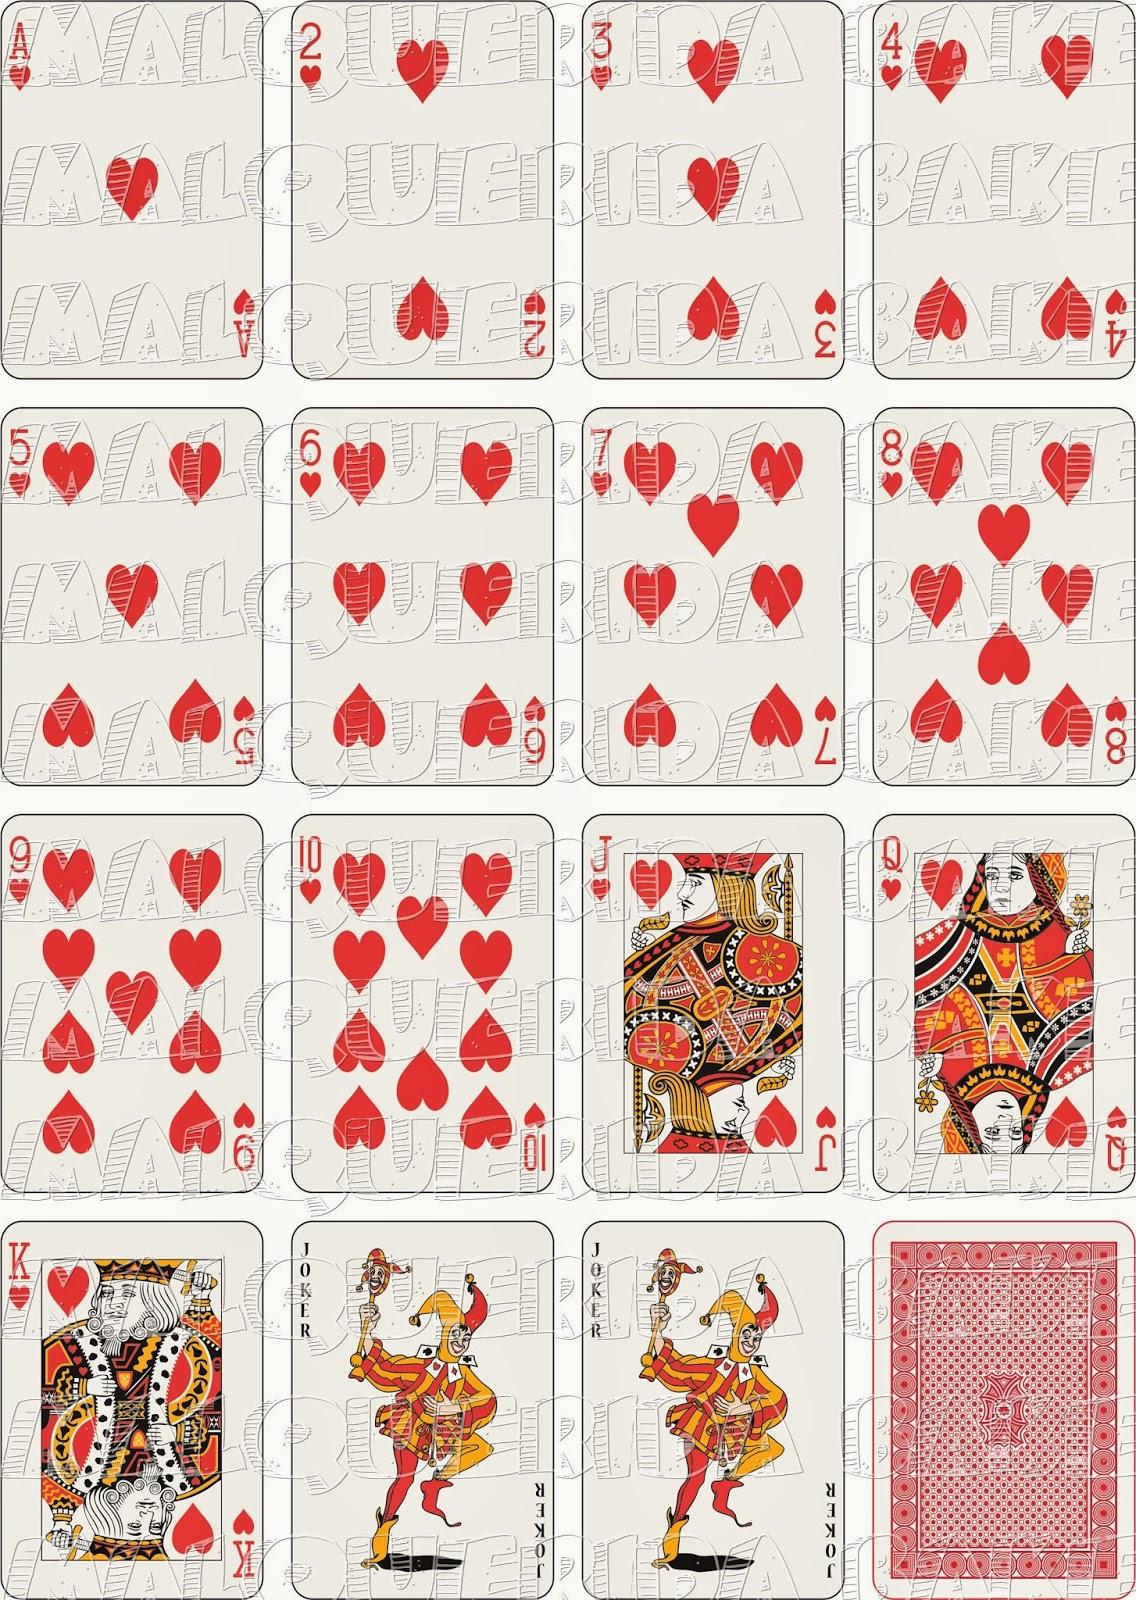 http://malqueridabakery.com/impresiones/986-poker-corazones.html